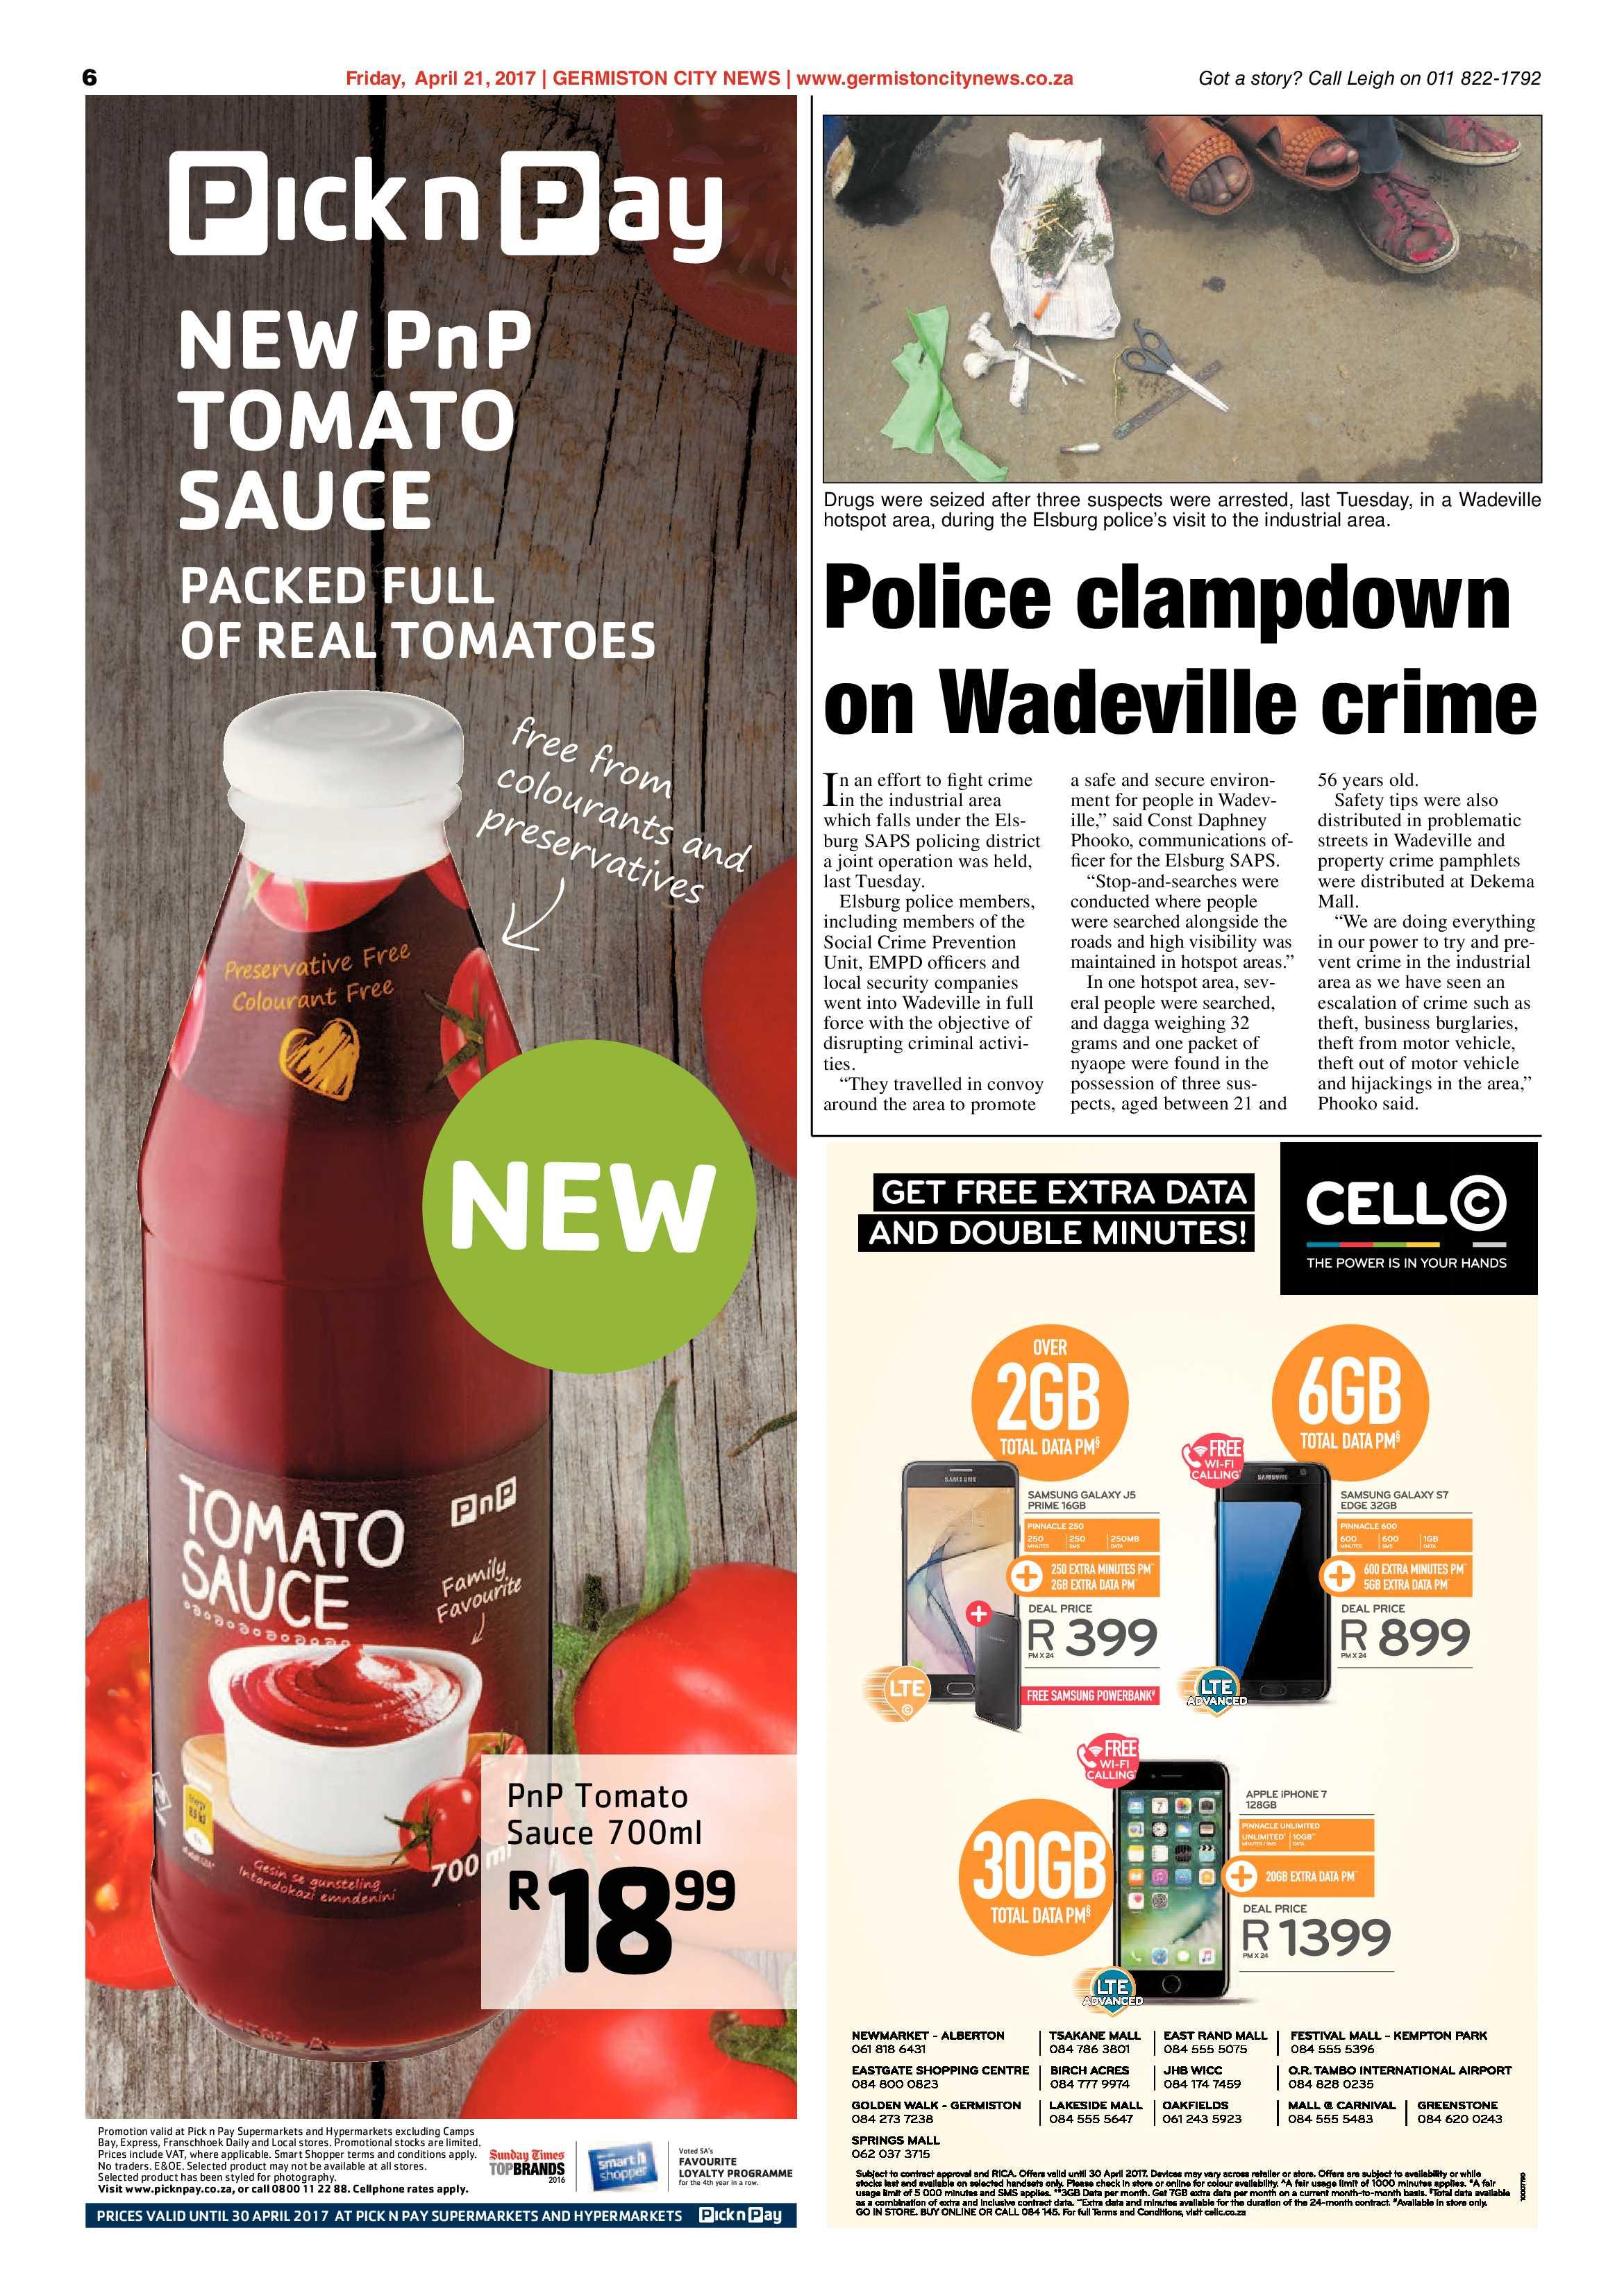 germiston-city-news-19-april-2017-epapers-page-6